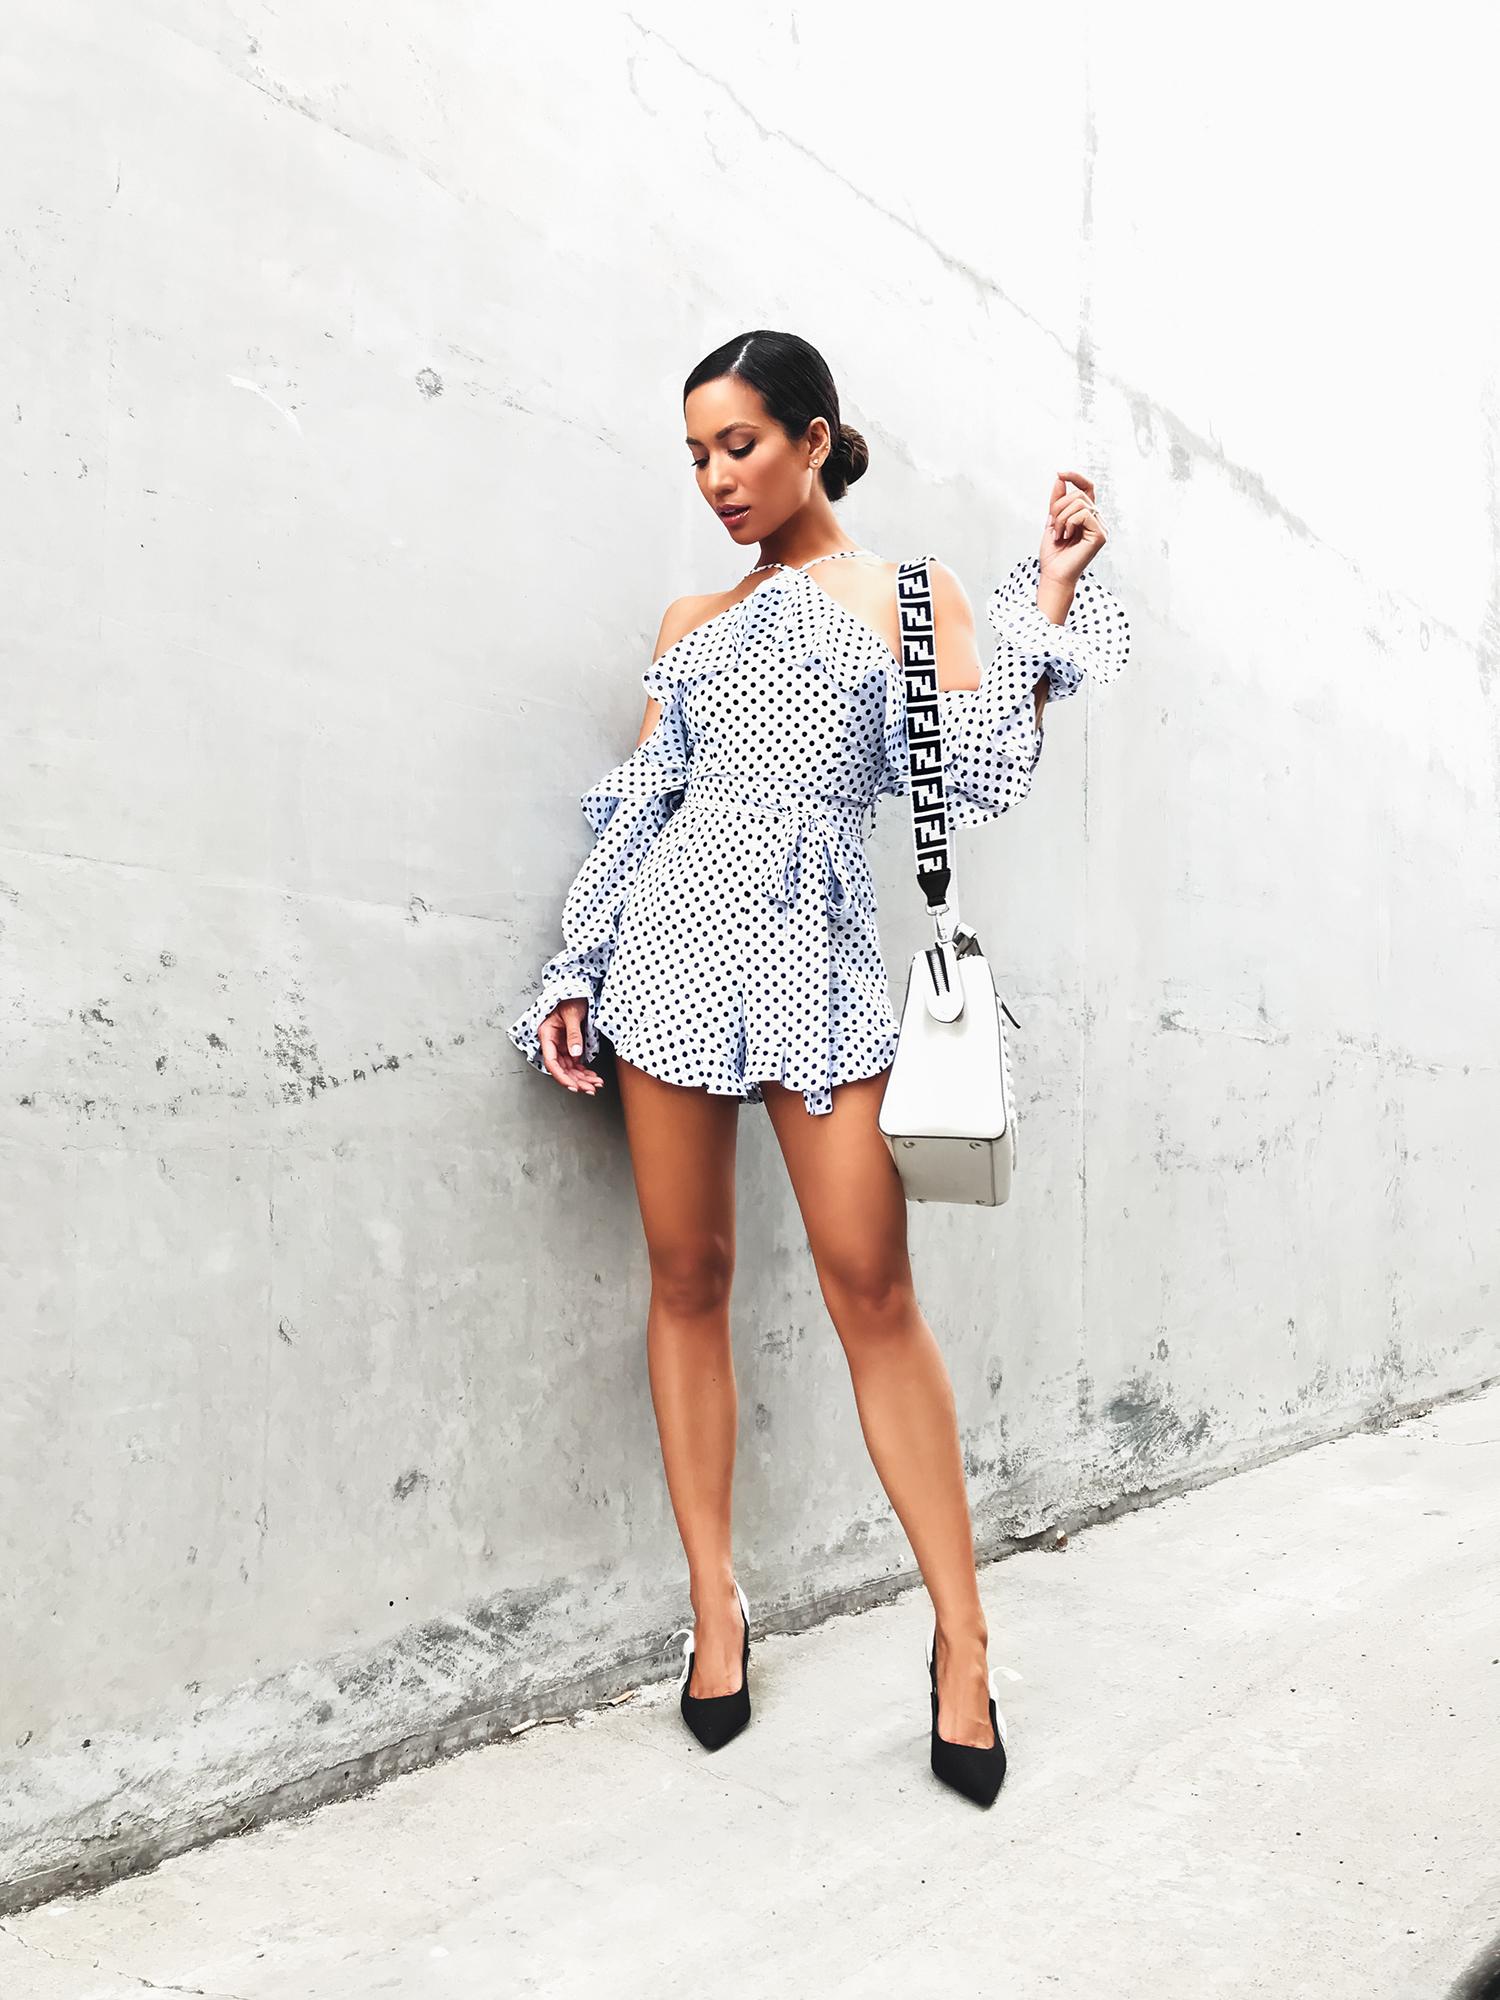 Jessi Malay wearing Fendi Dotcom Bag Strap